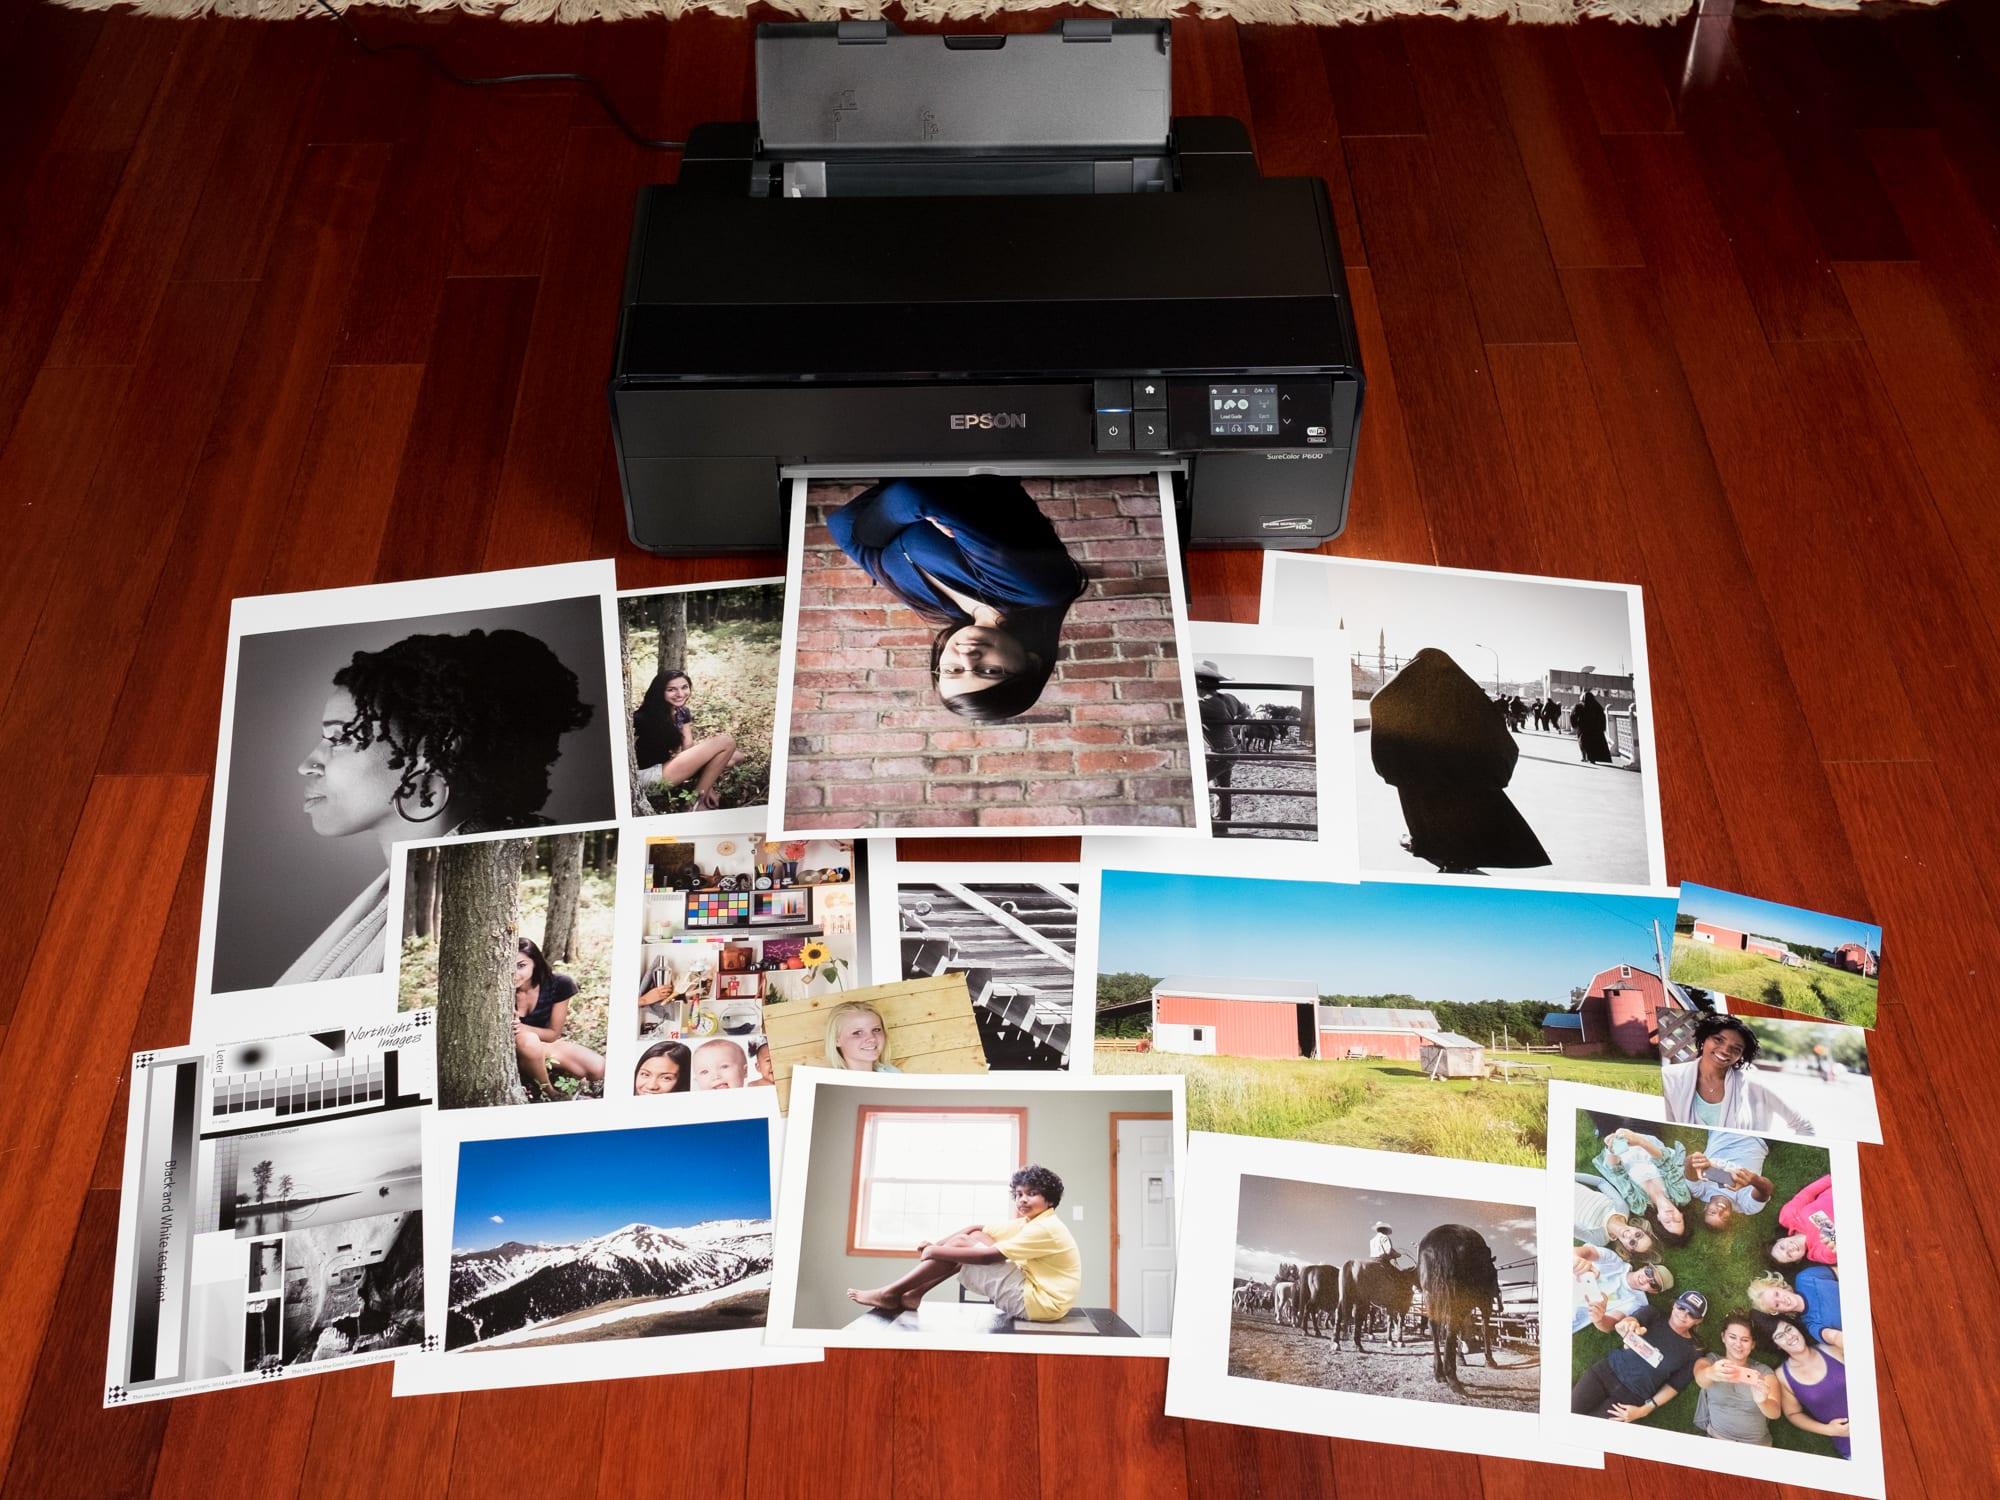 Best Inkjet Printers 2020 The best photo inkjet printer